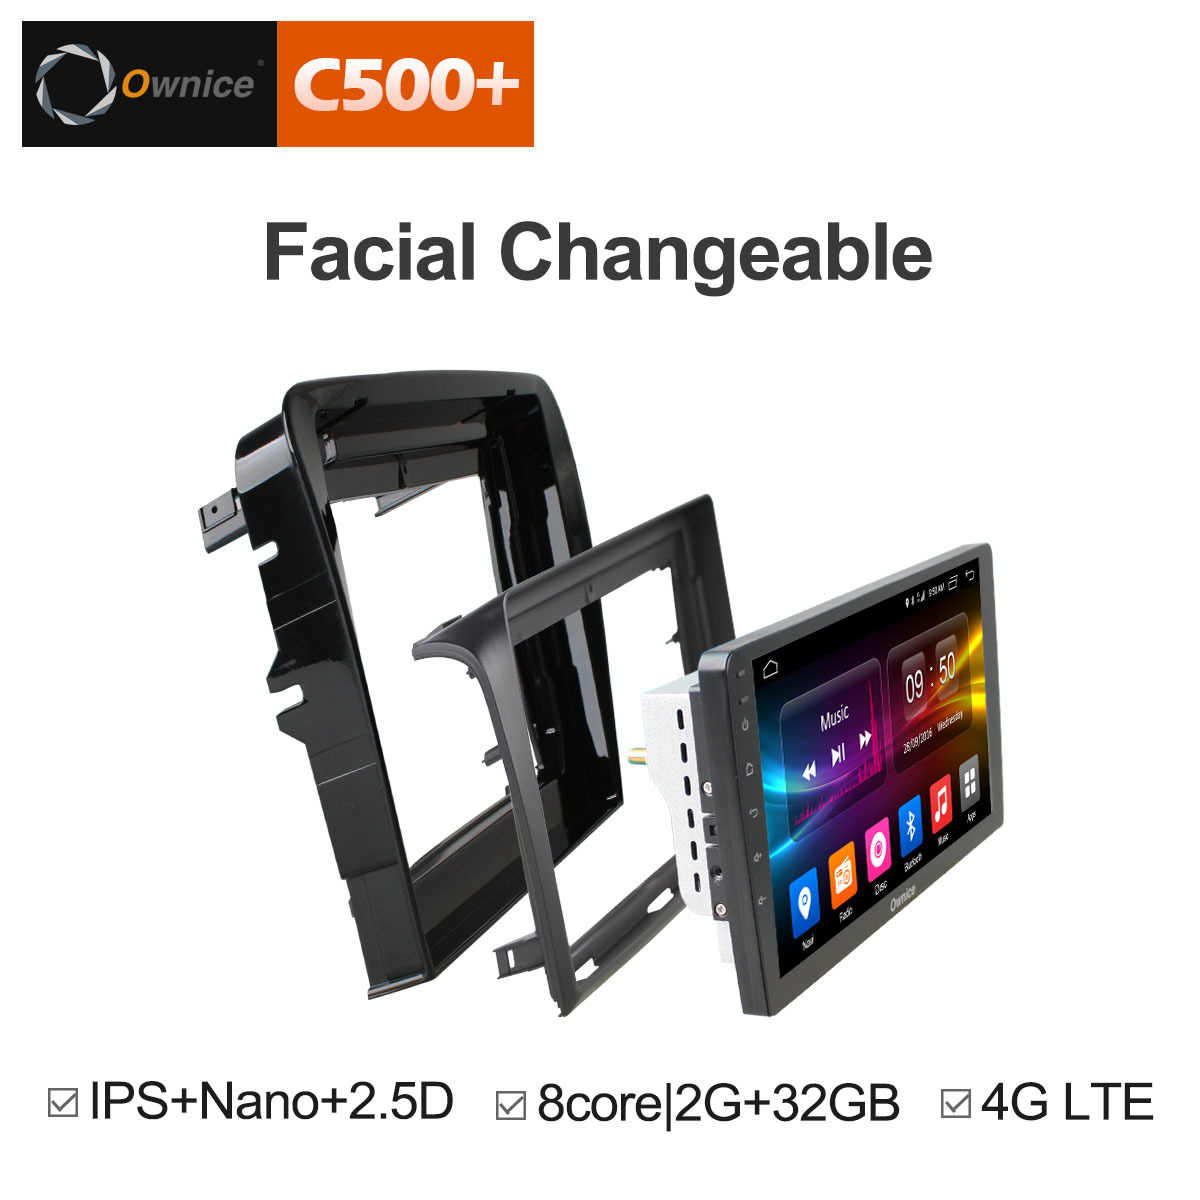 "Ownice C500 + G10 8 Core 10.1 ""Android Auto Radio Stereo Auto dvd-speler GPS voor Subaru Forester Toyota CAMRY Hyundai Santa Fe"